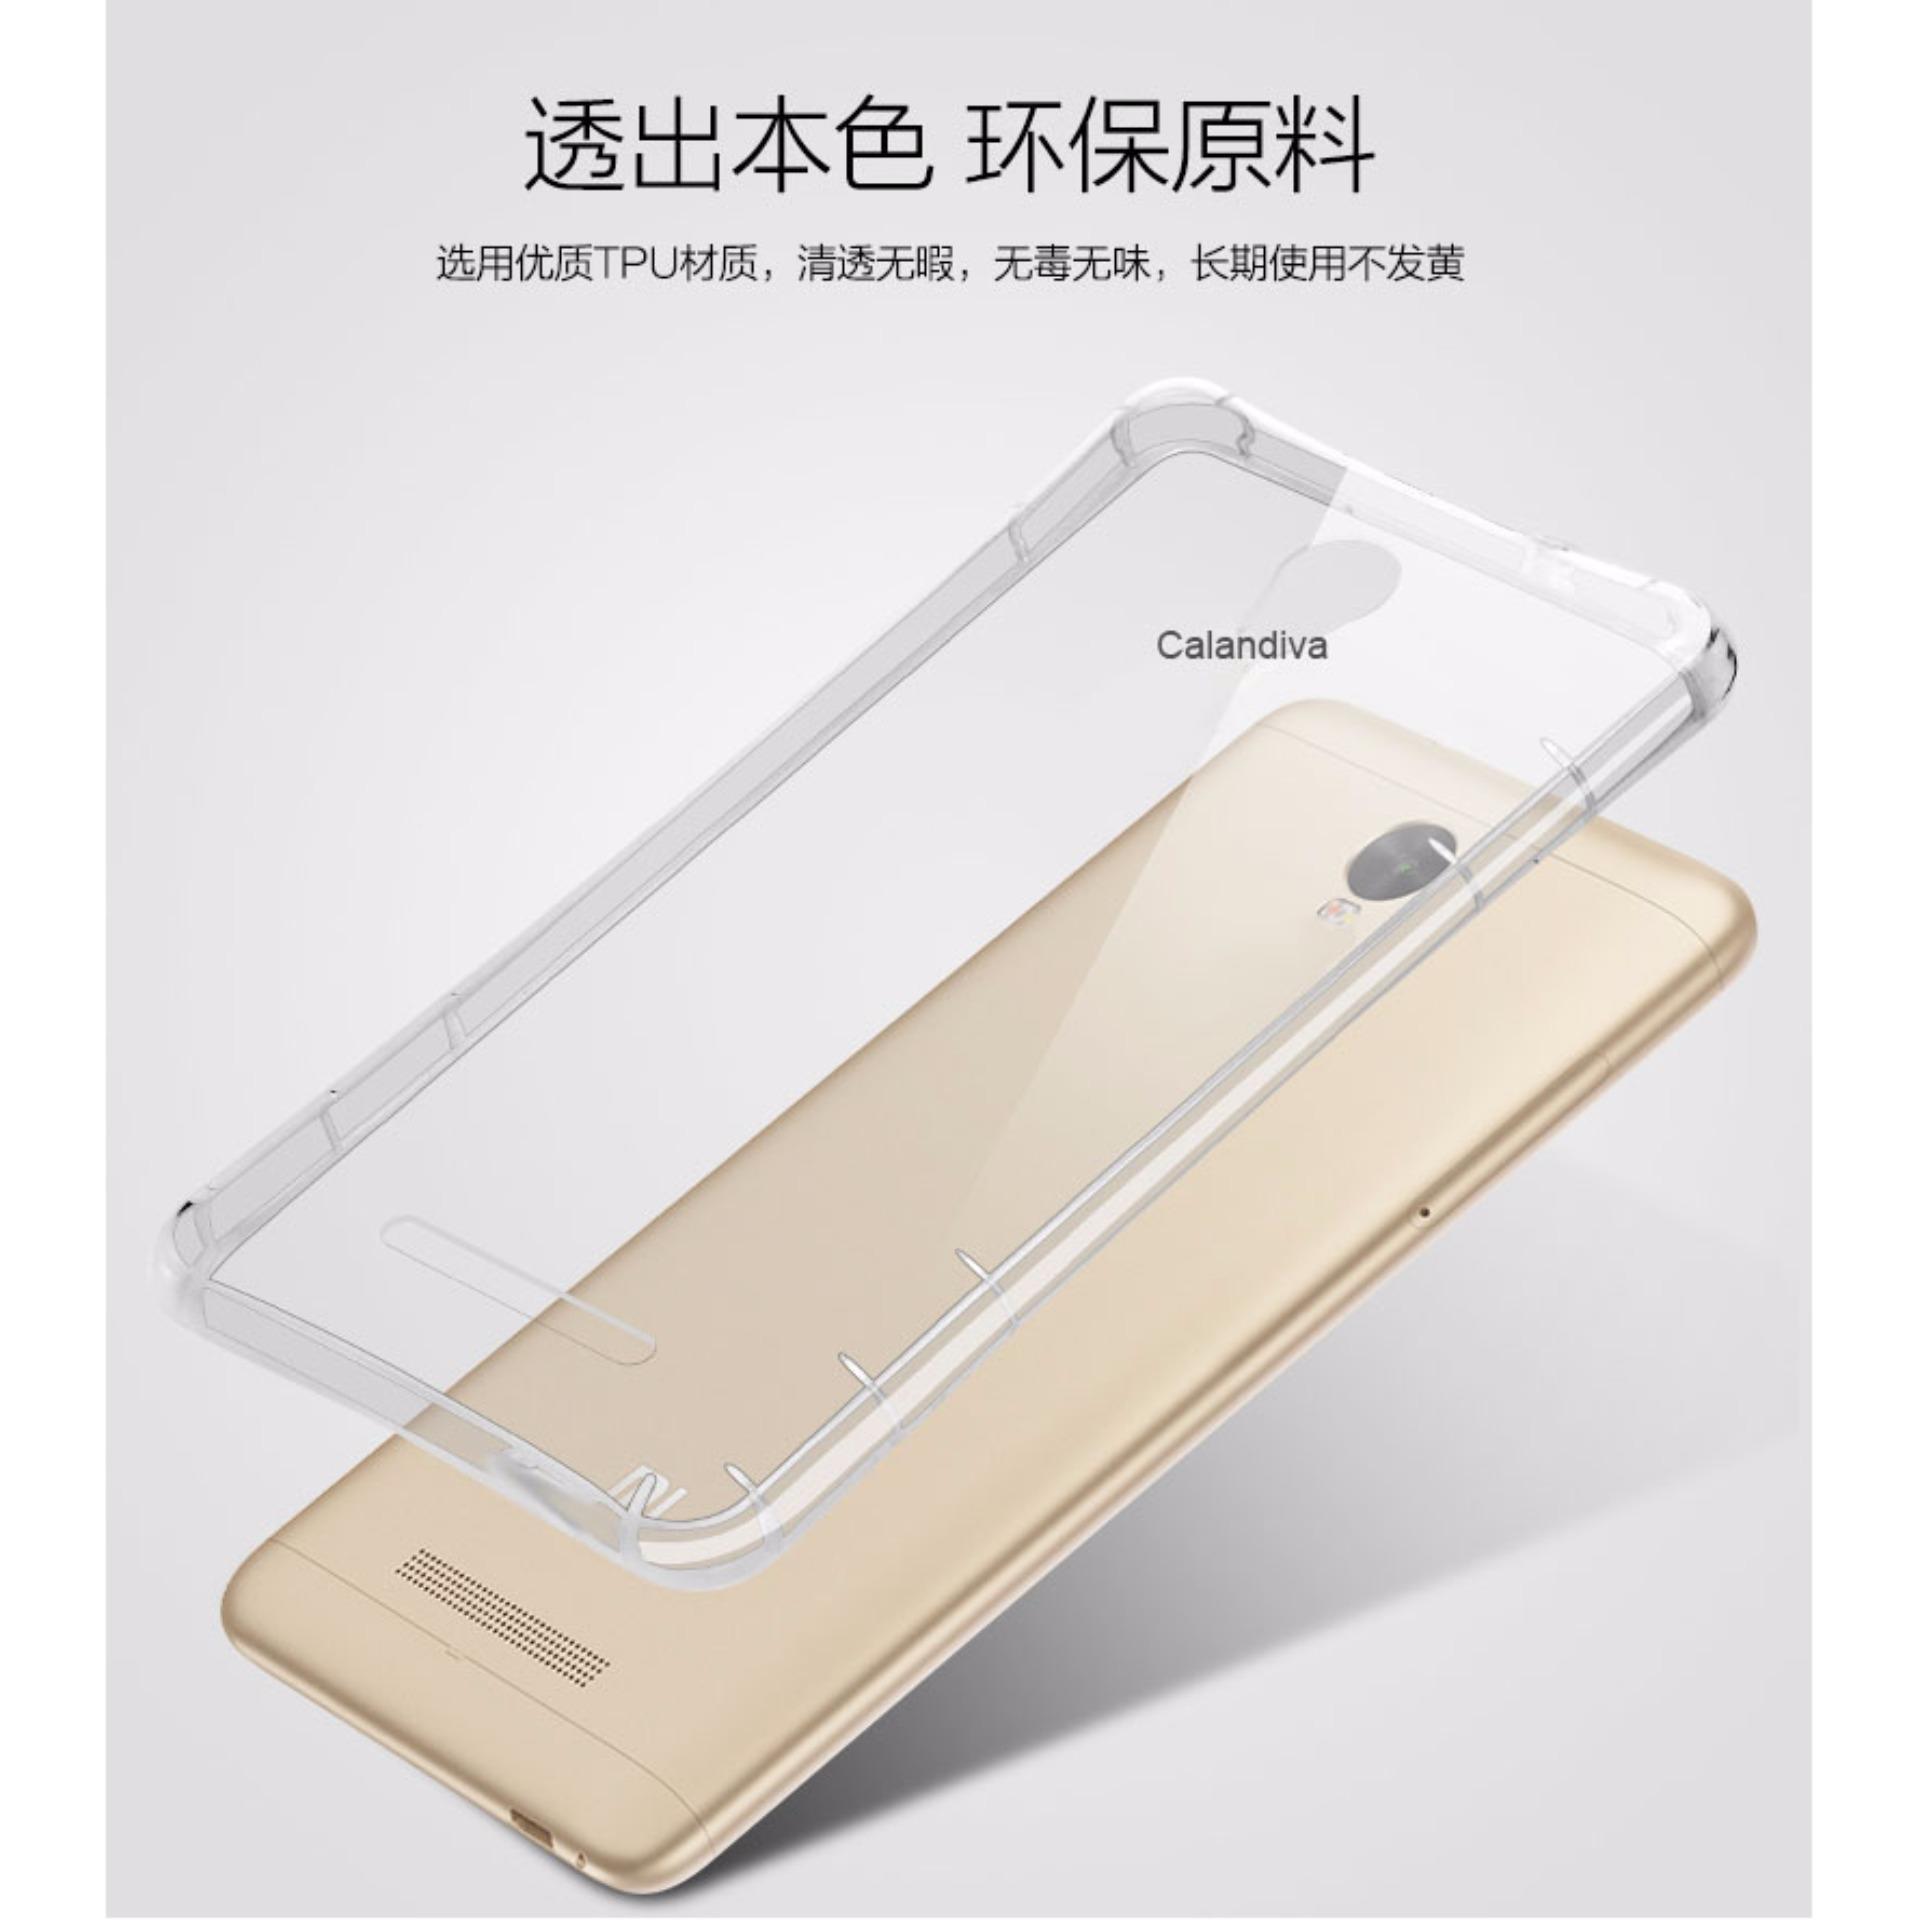 Calandiva Shockproof Tpu Ultrathin Case Untuk Xiaomi Redmi 2 Prime Luxury Tempered Glass Premium For Note 5 Hitam Pro